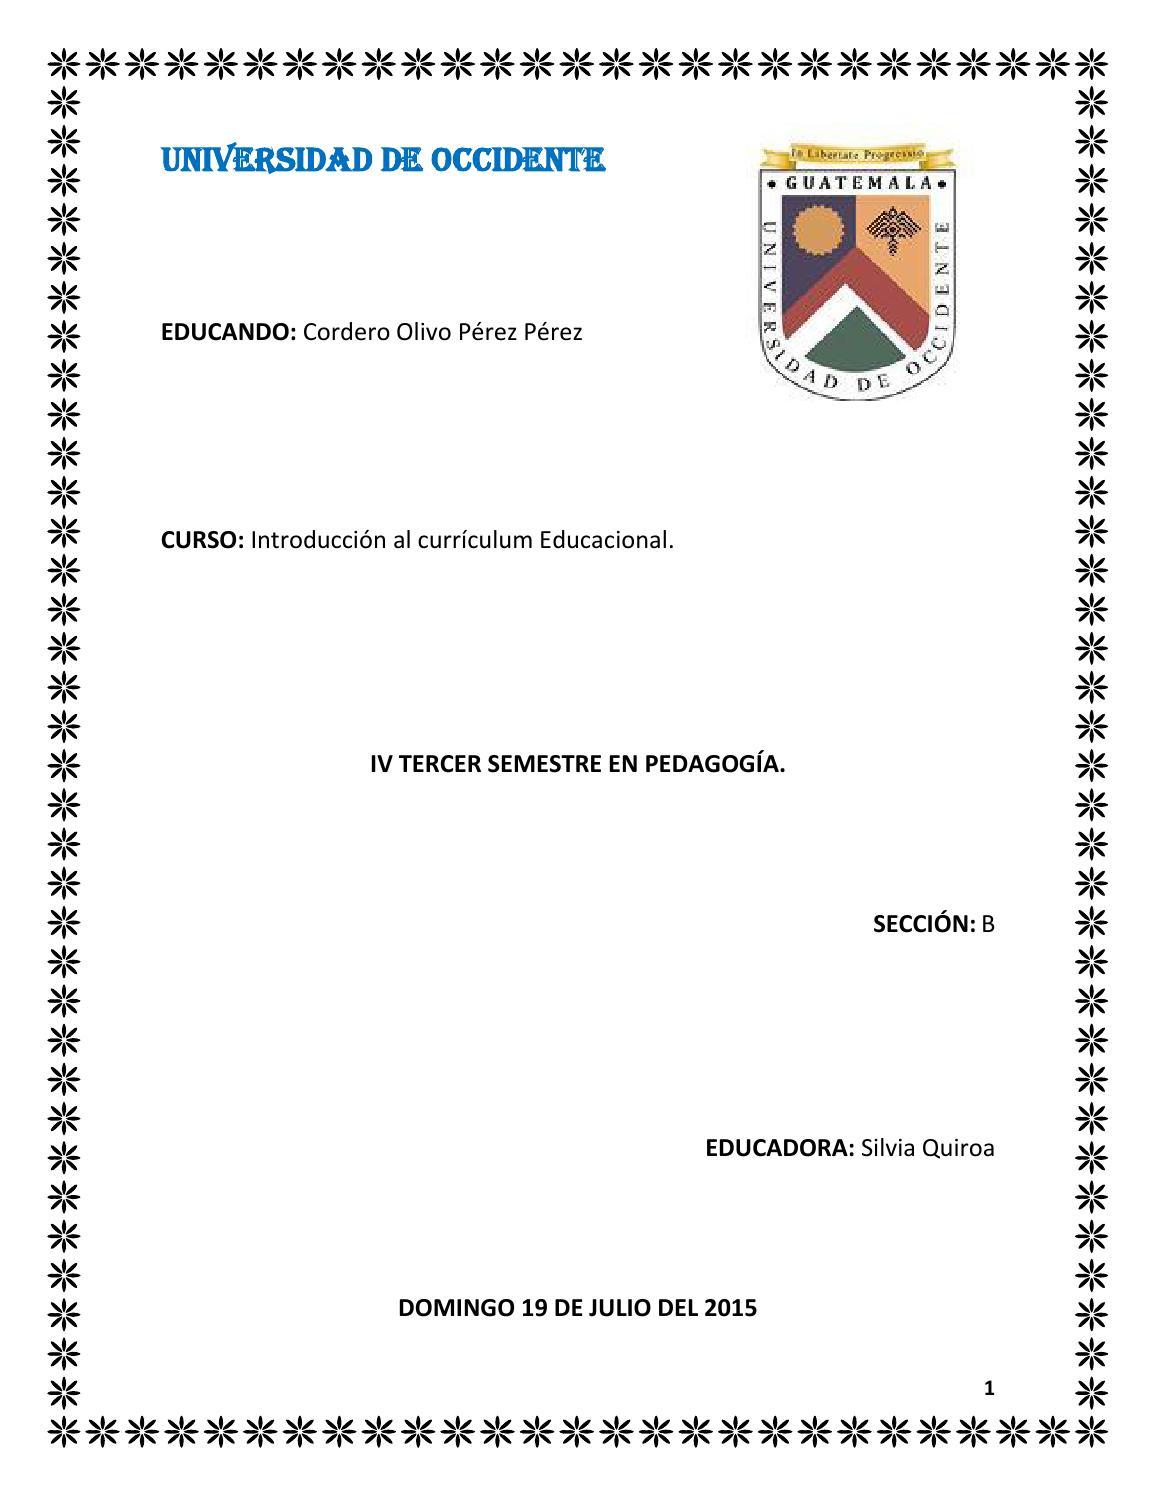 Los fundamentos del curriculum 2 by Perez Perez Olivo - issuu